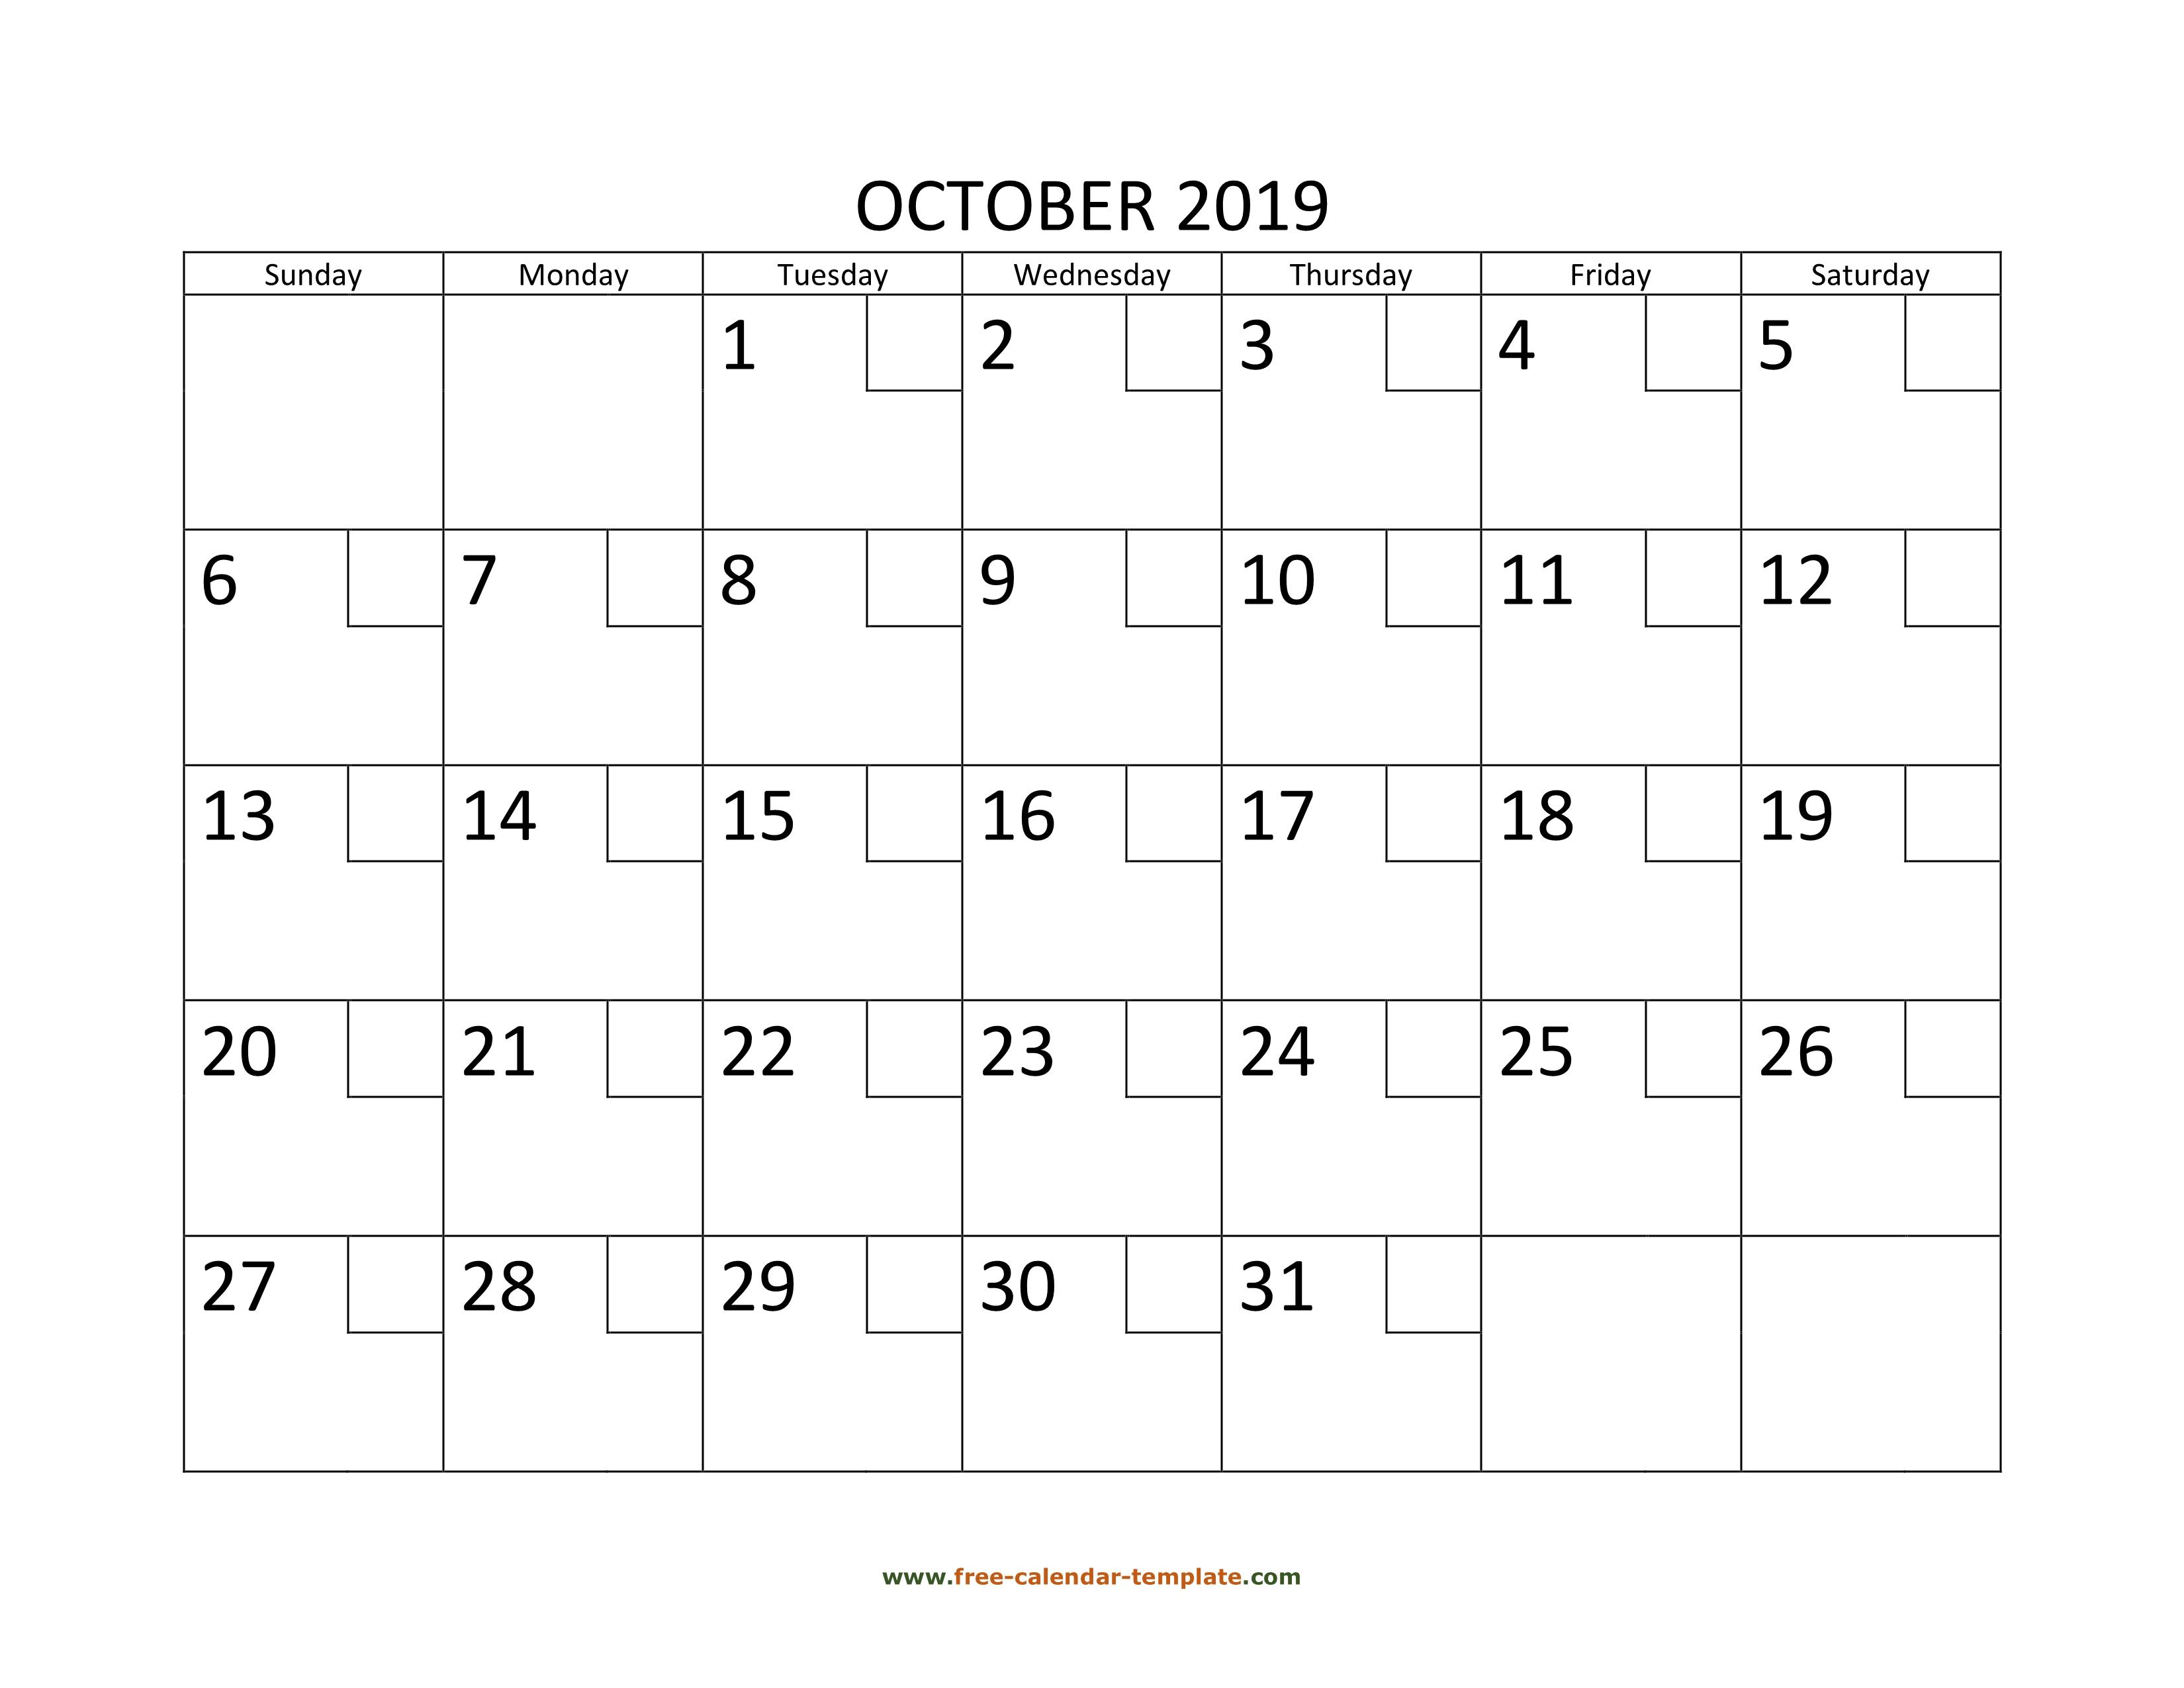 October Calendar 2019 Printable With Checkboxes Horizontal